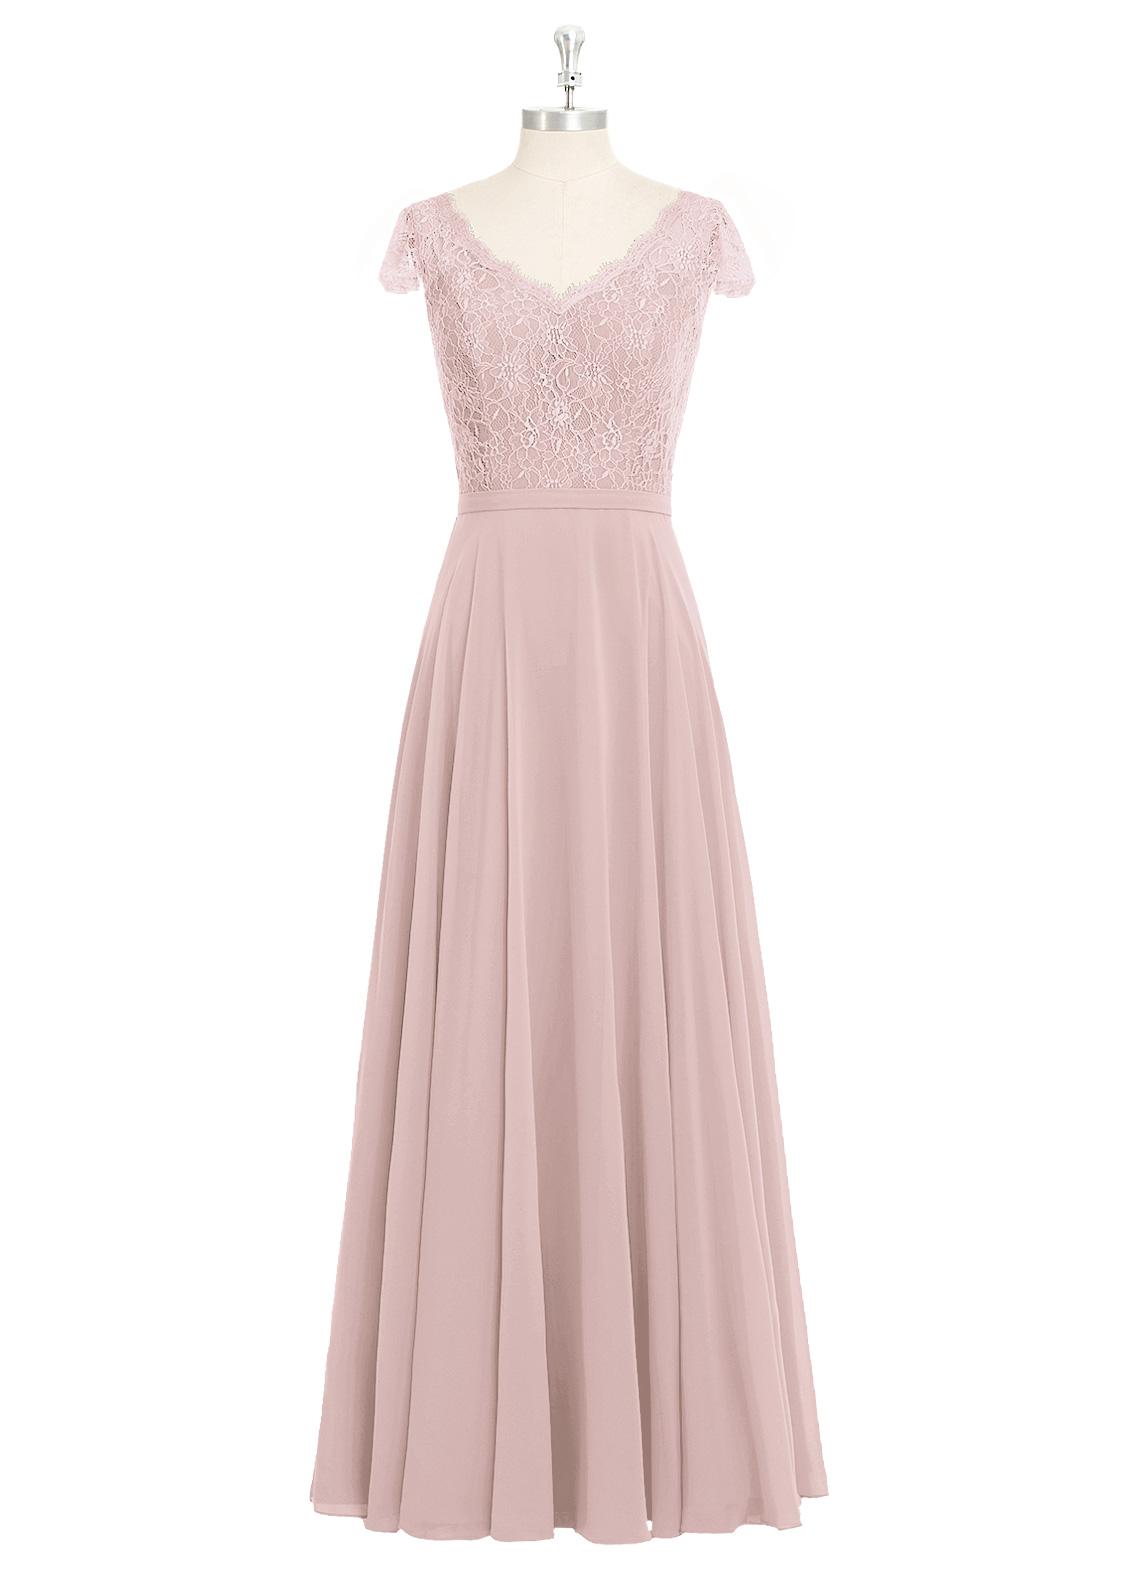 AZAZIE Cheryl Bridesmaid Dress